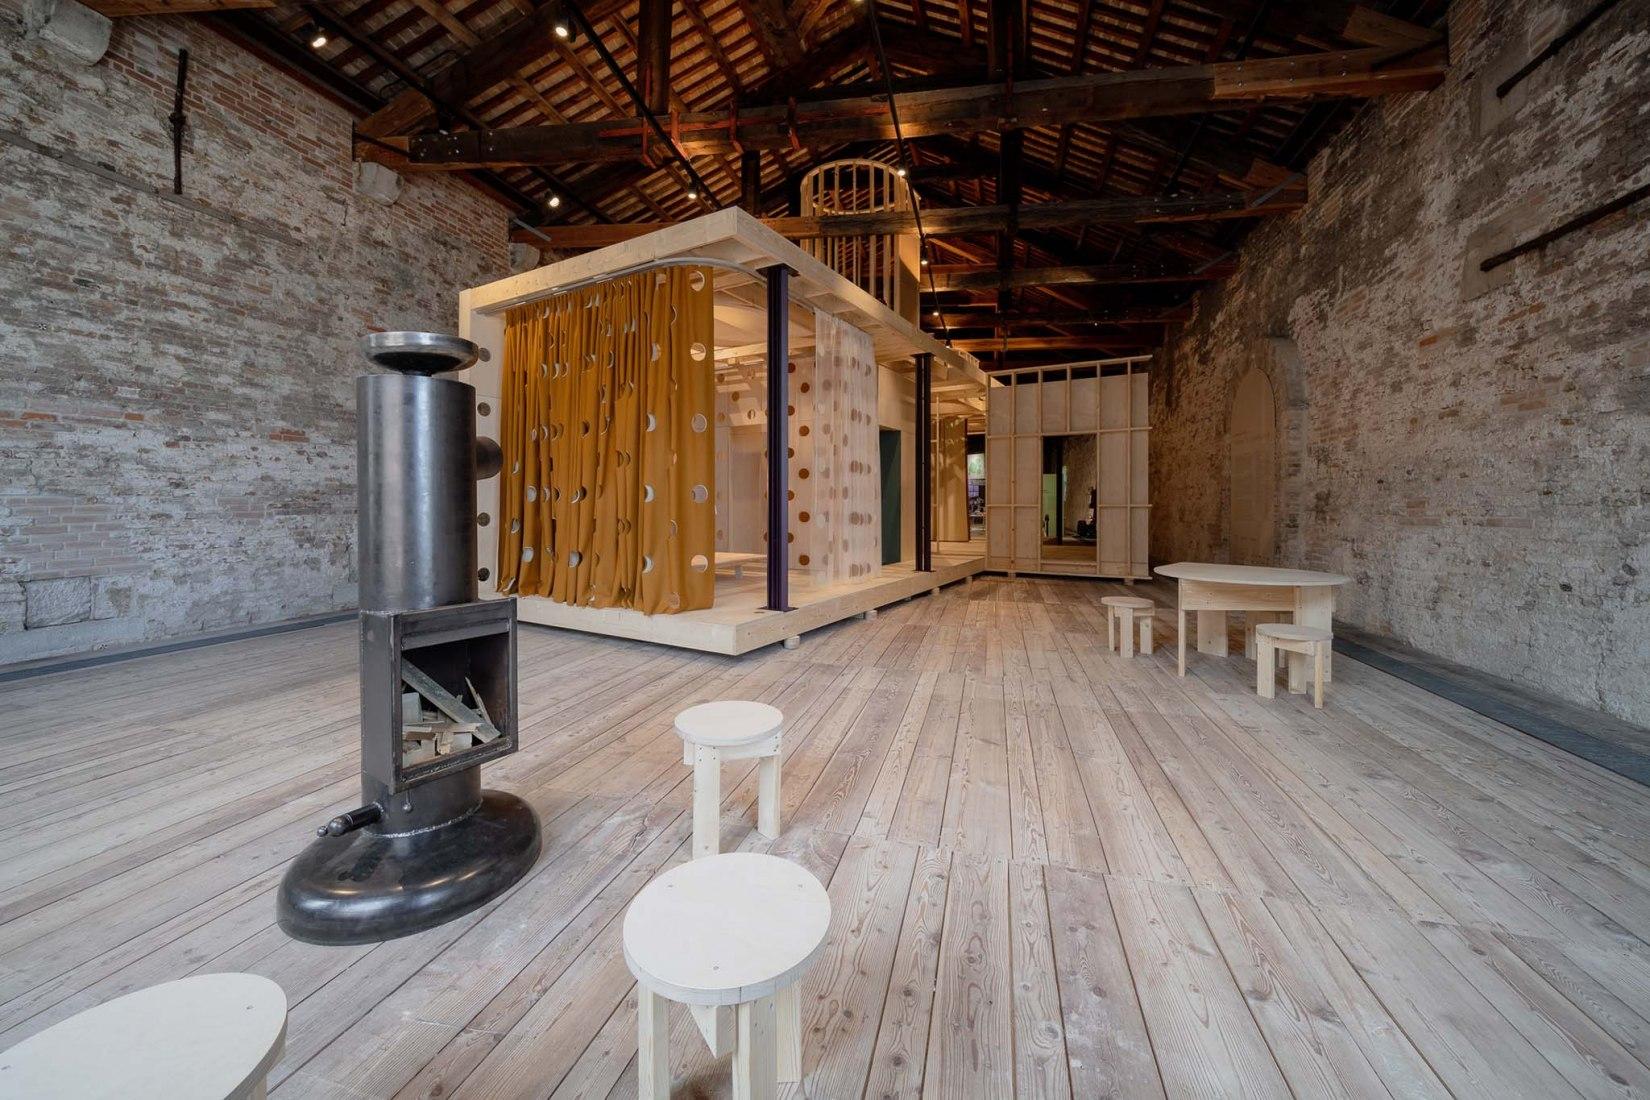 Homes for Luxembourg. Luxembourg Pavilion, 17th International Architecture Exhibition of La Biennale di Venezia. Photograph by Andrea Avezzù.